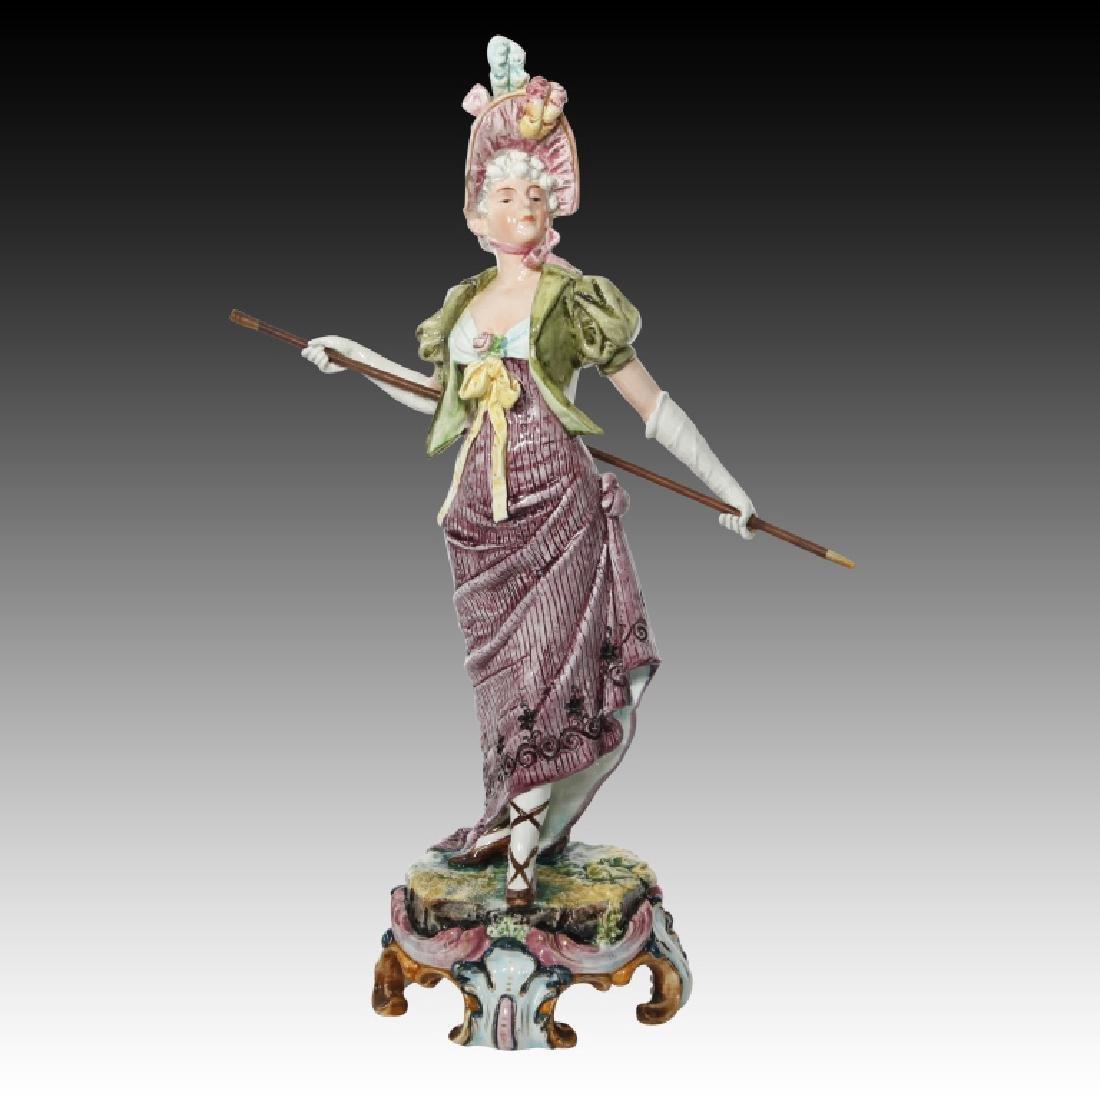 Majolica Figural Pair of Women in Regency Dress - 4